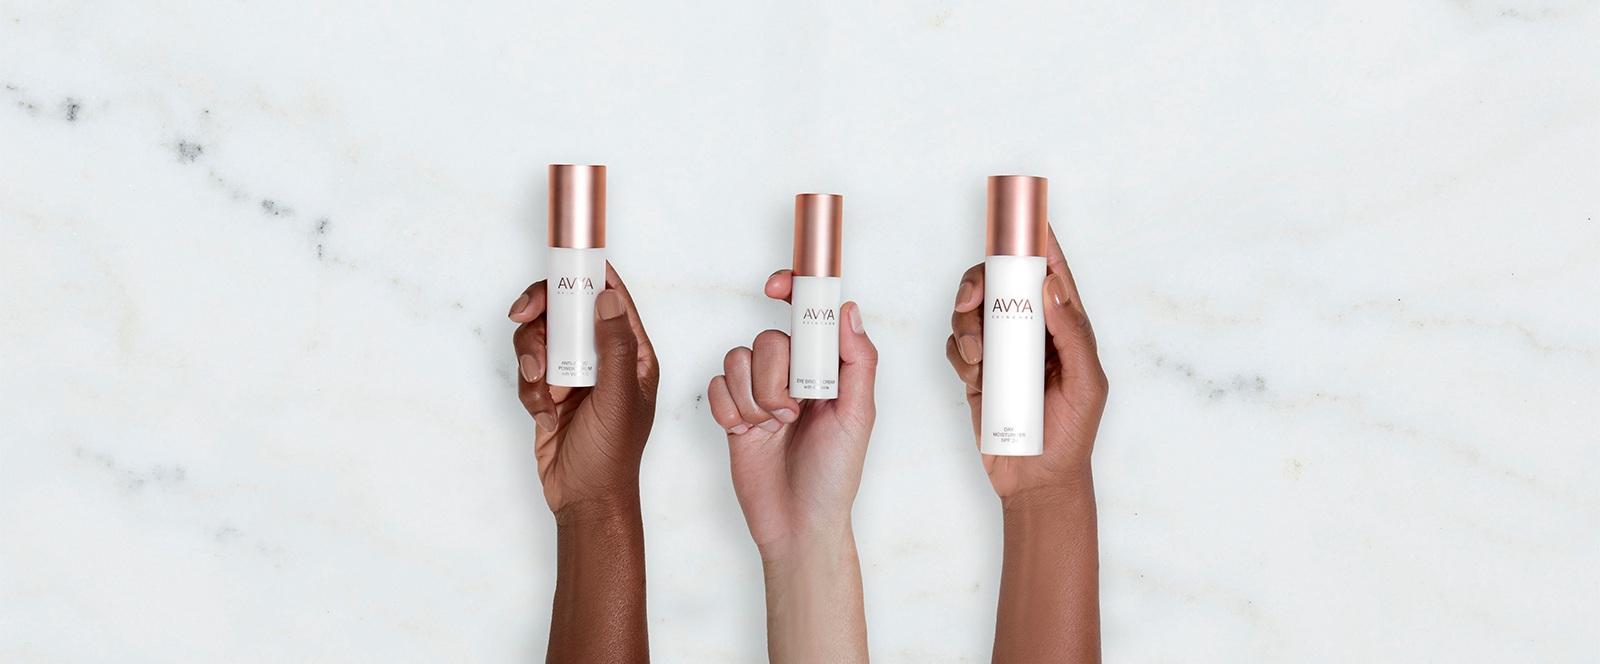 AVYA Skincare - Brand Development | Packaging | Visual Identity | eComm | G2M Strategy